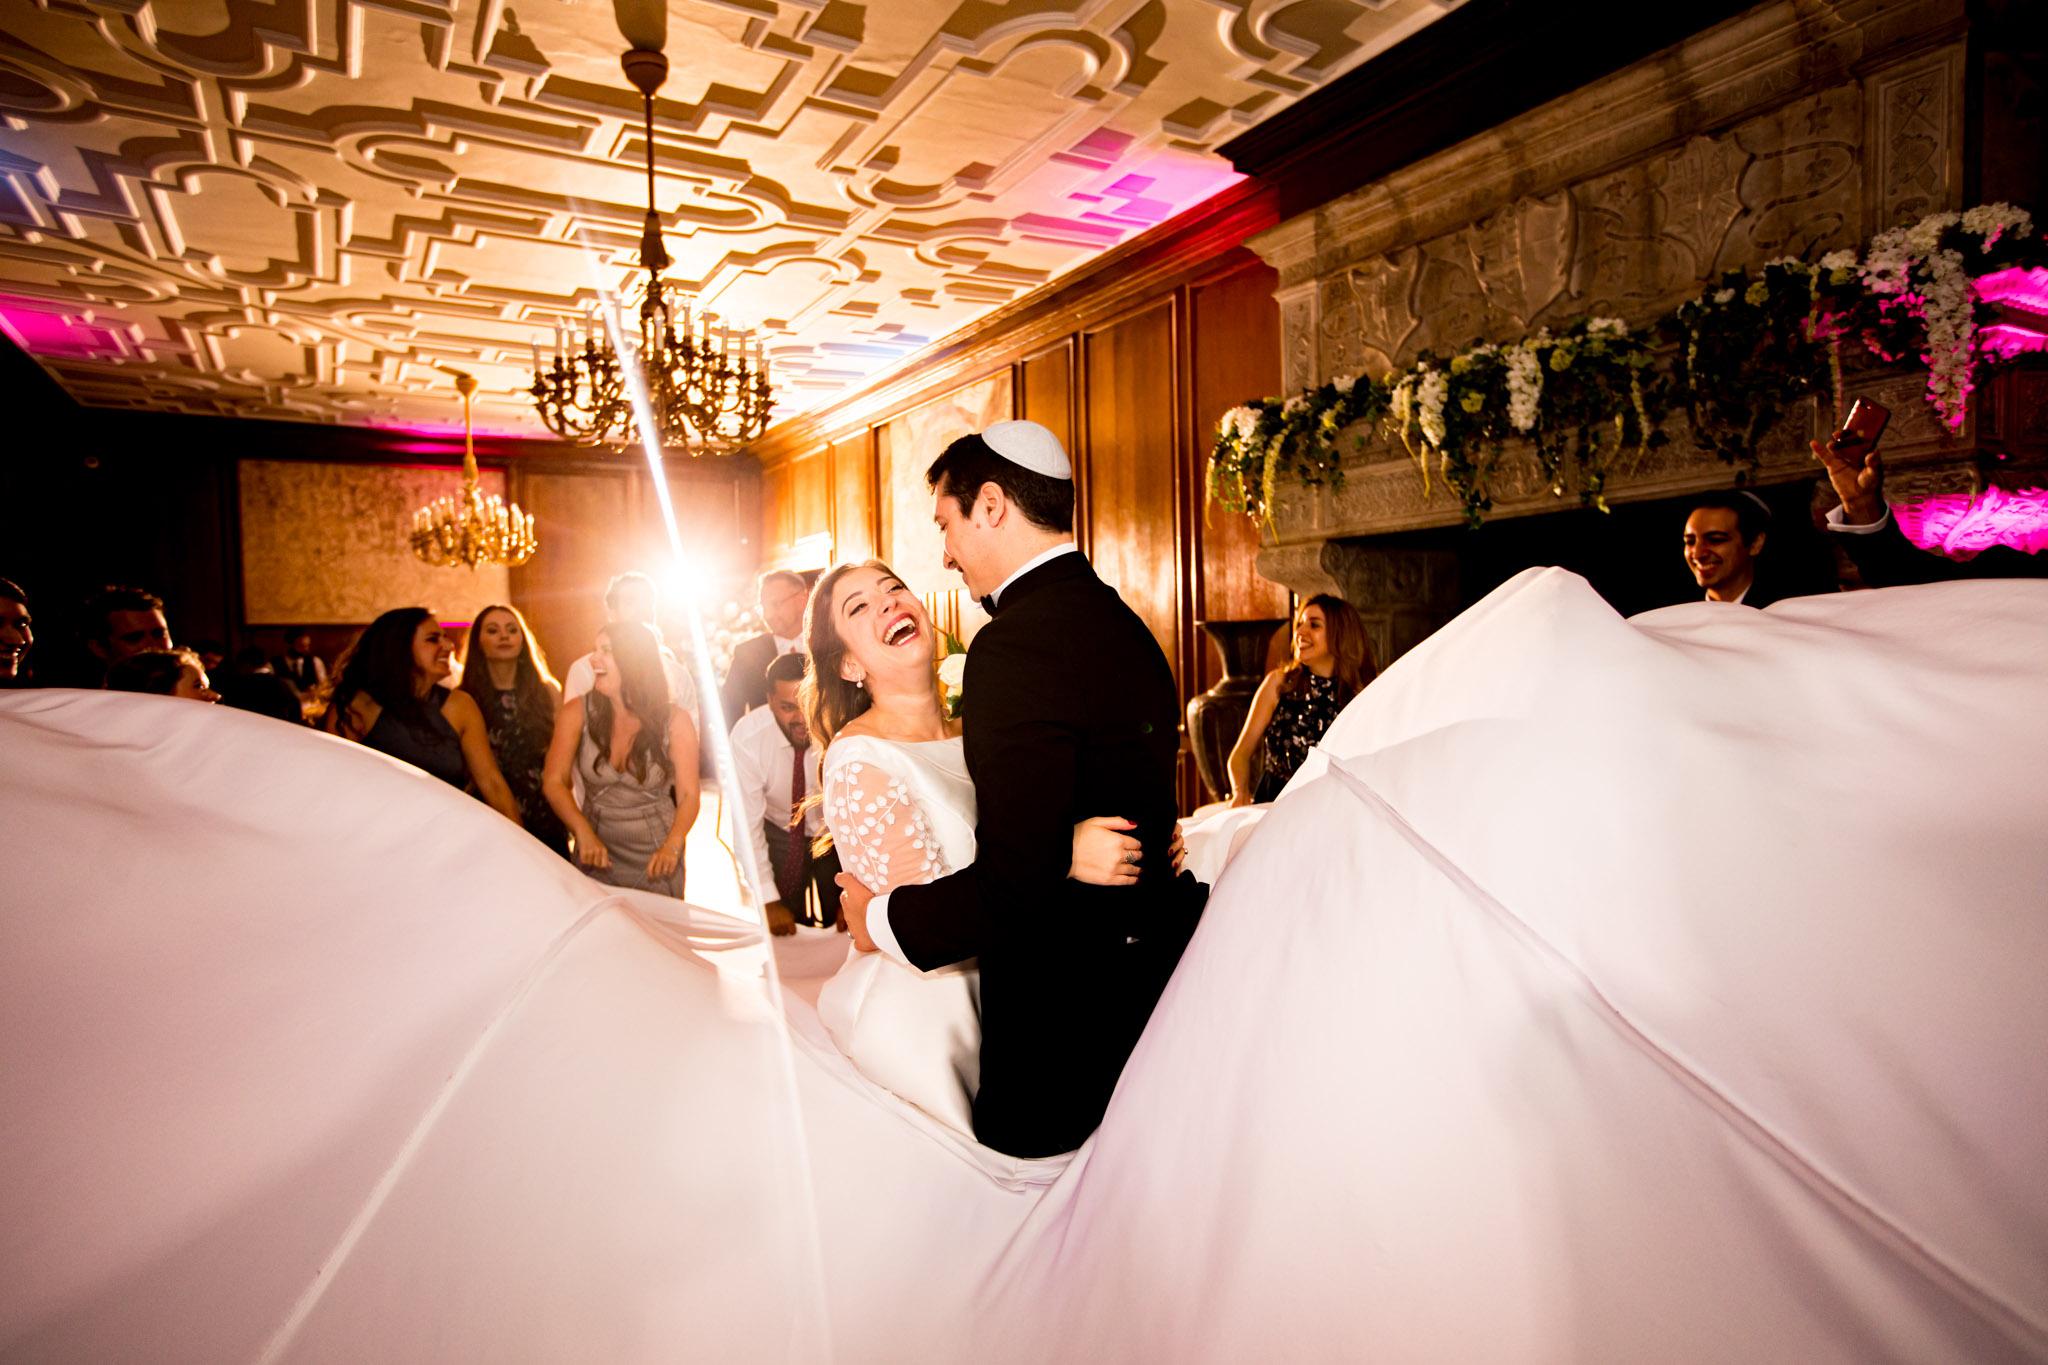 North Mymms Park: Amanda & Daniel's Jewish Wedding Photo